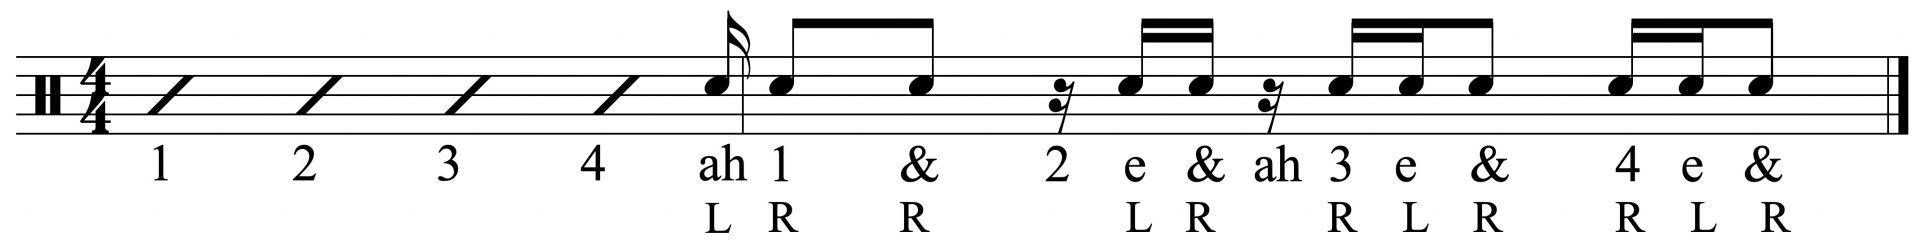 The basic rhythm